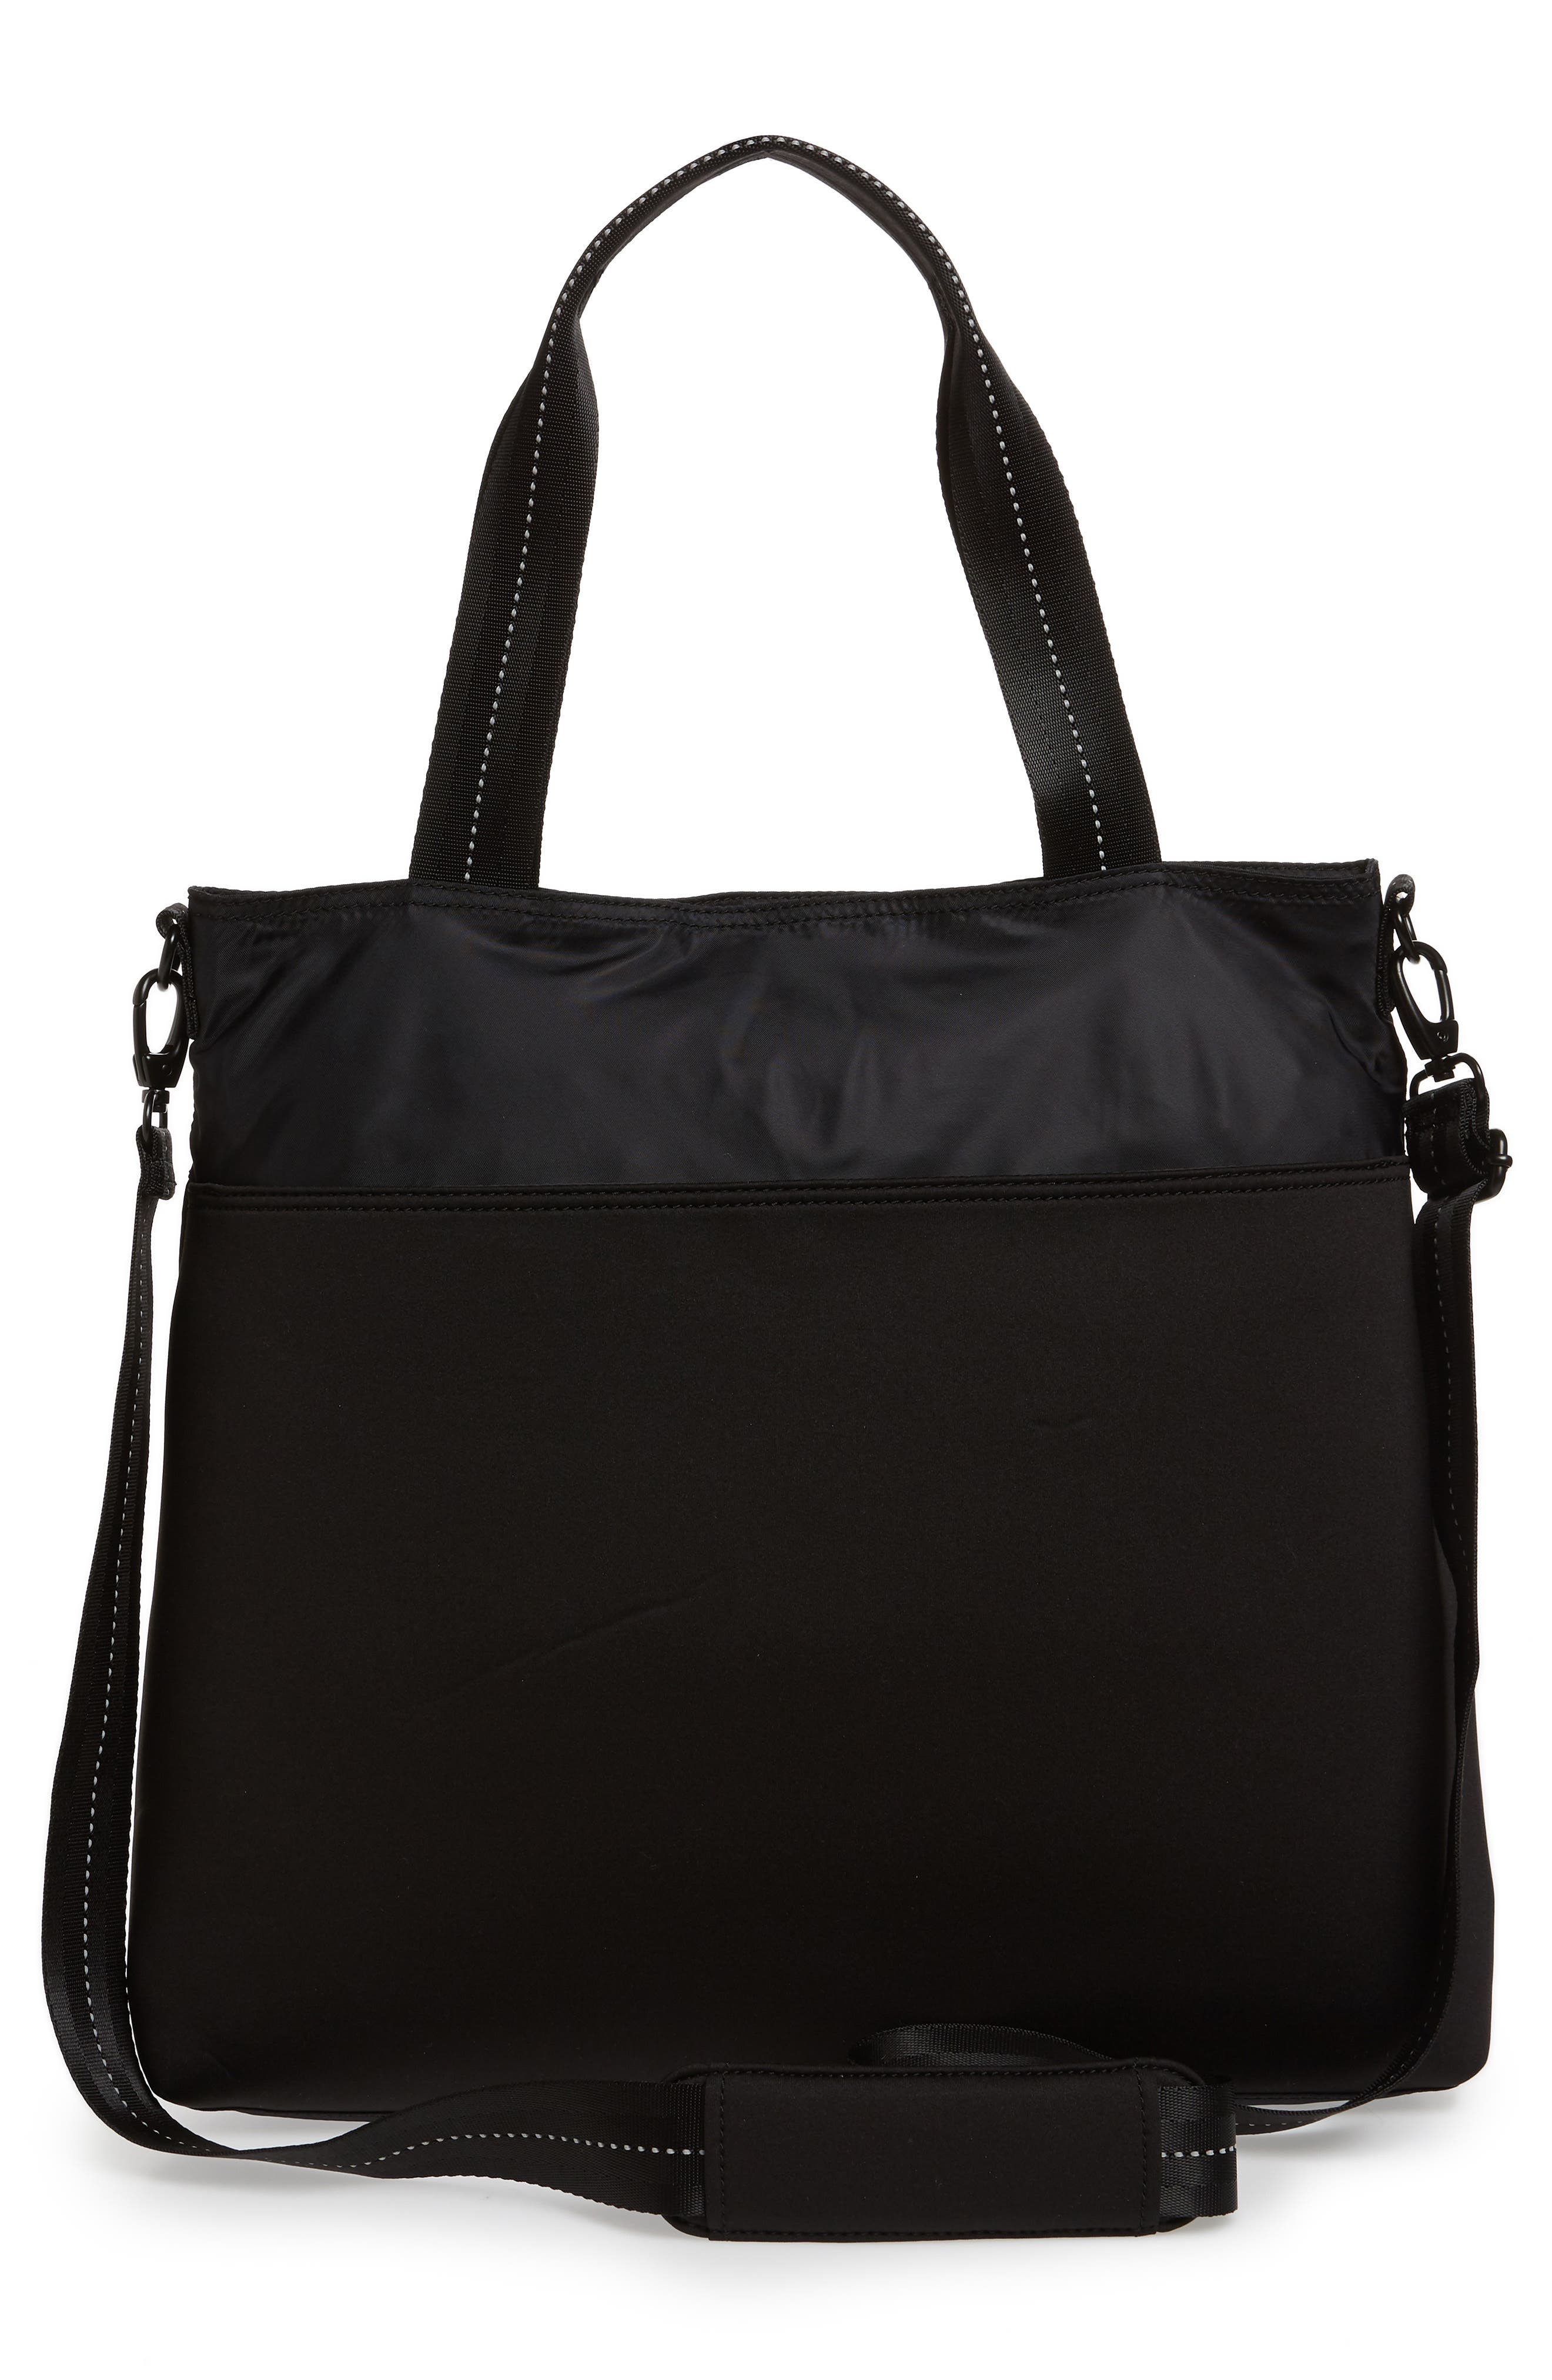 ZELLA,                             Reflective Nylon Tote Bag,                             Alternate thumbnail 3, color,                             BLACK